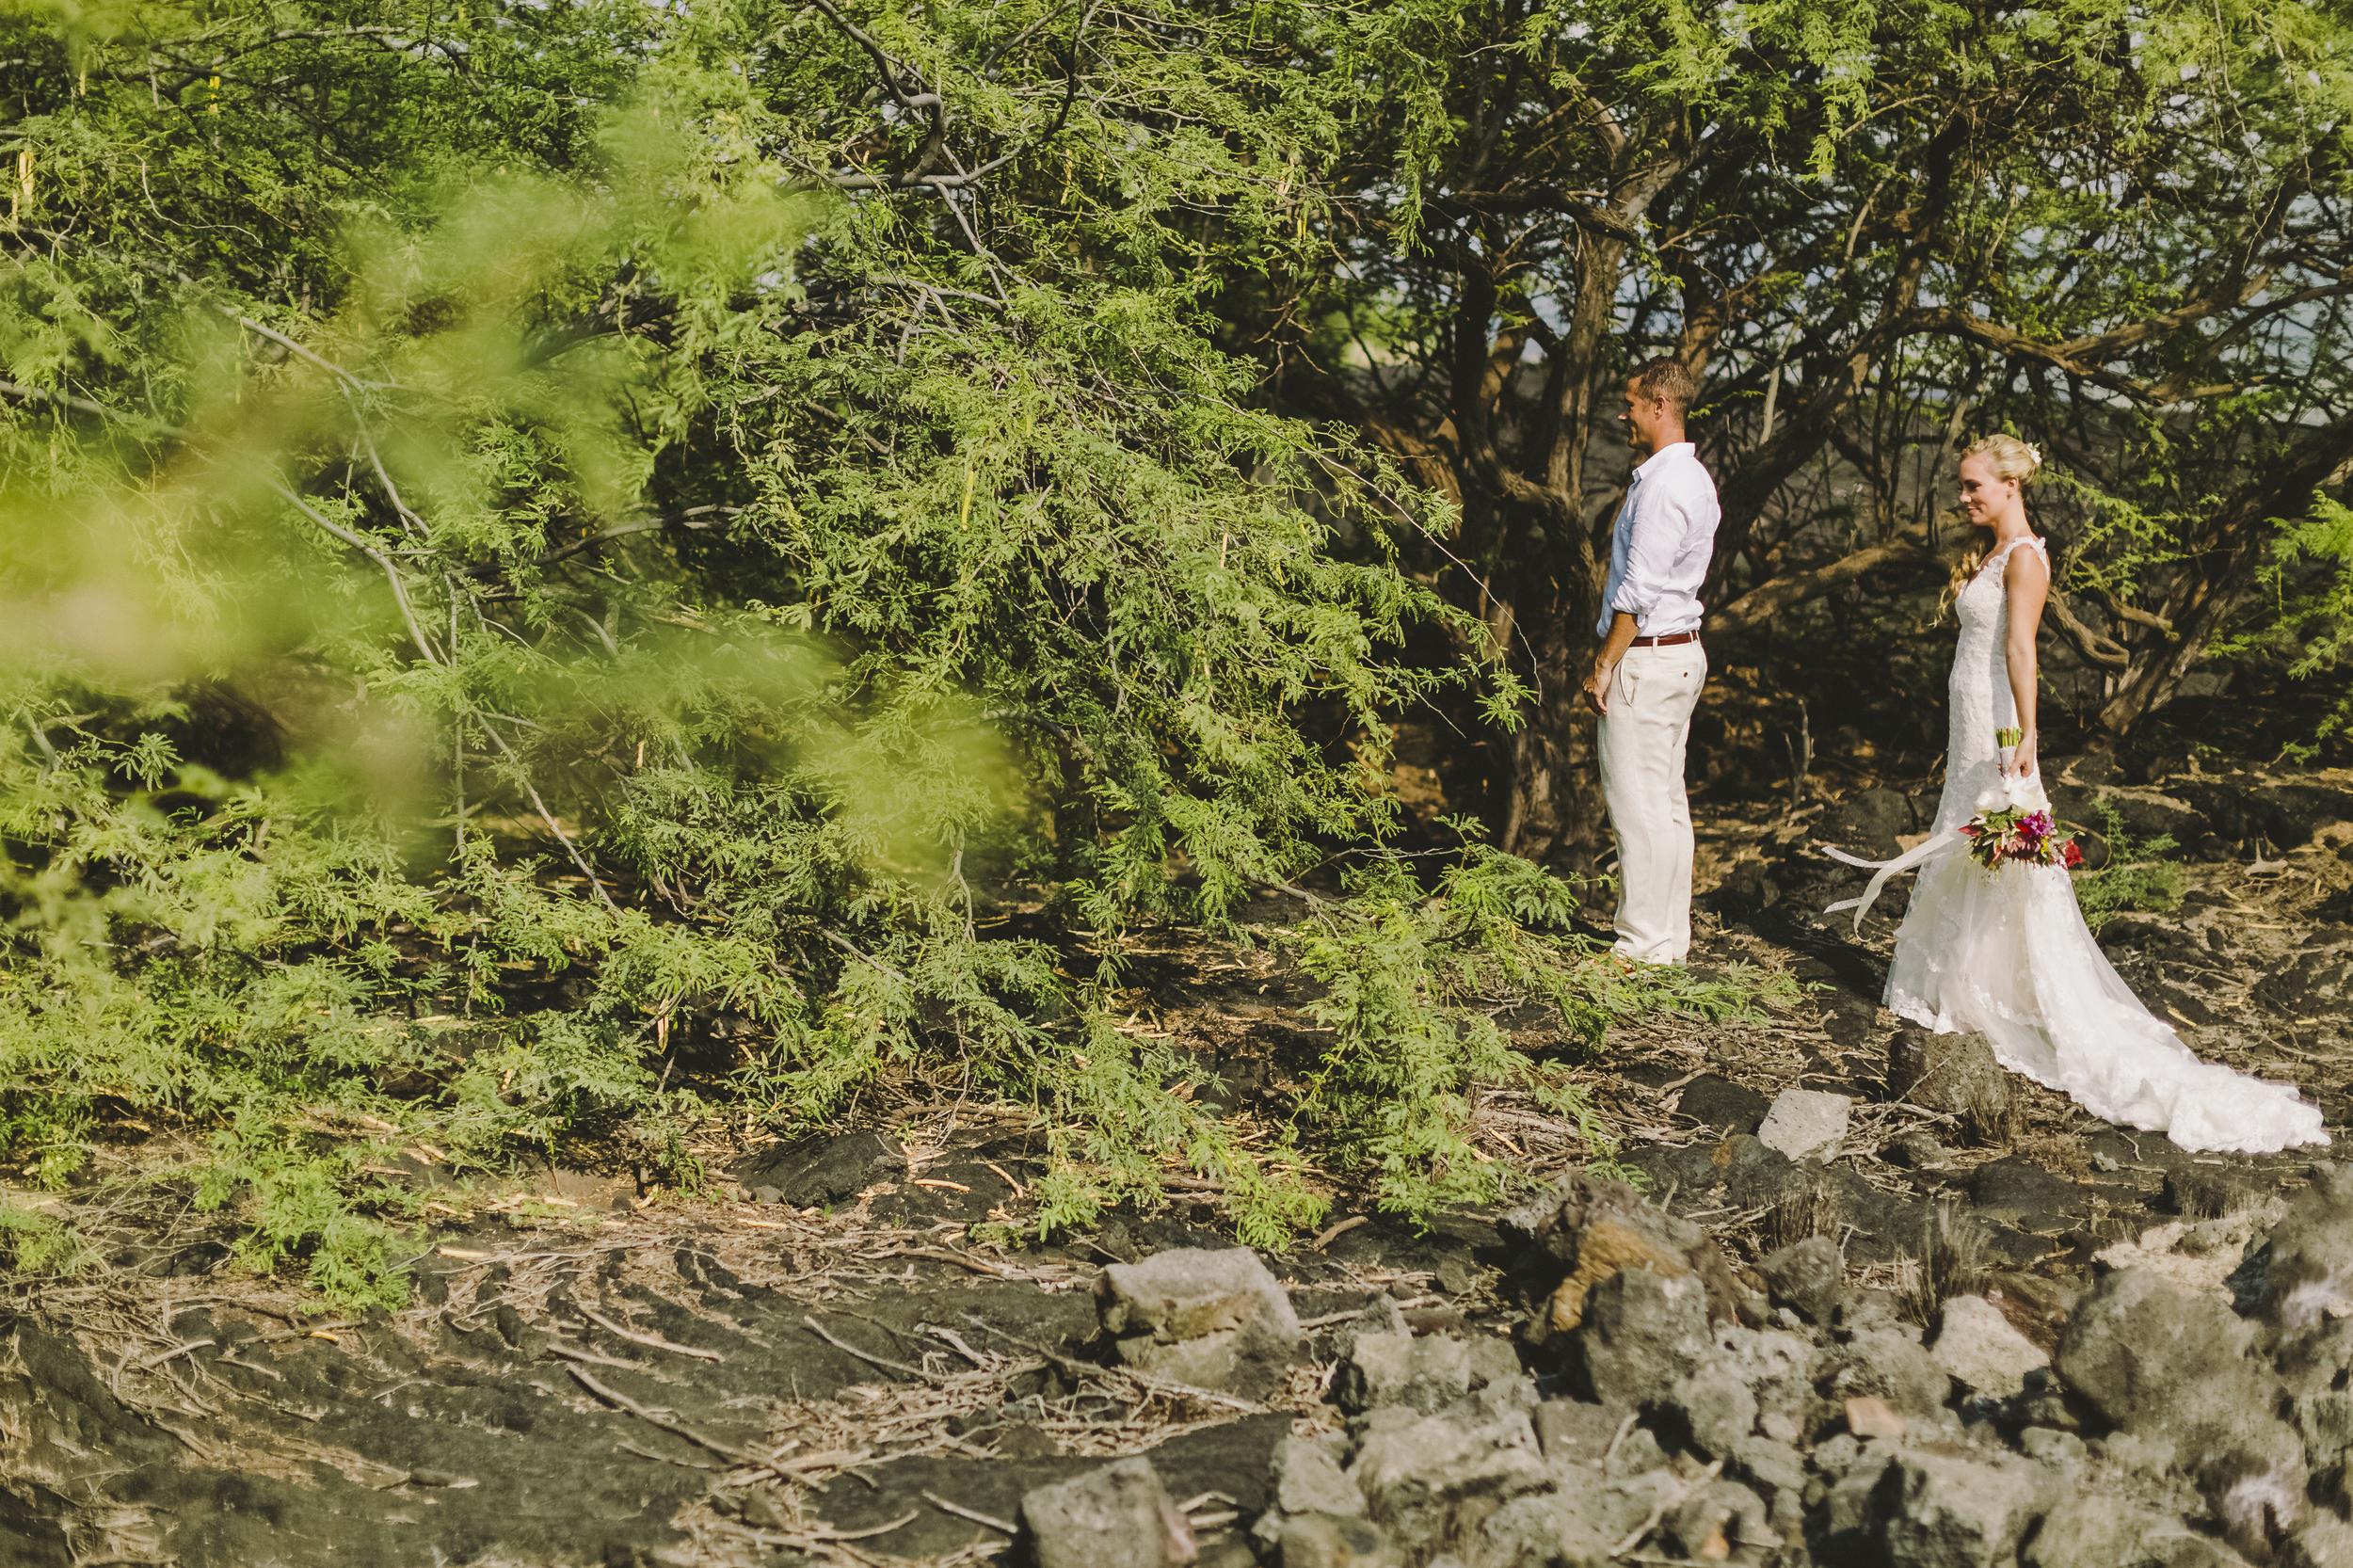 angie-diaz-photography-hawaii-wedding-photographer-kelli-jay-27.jpg